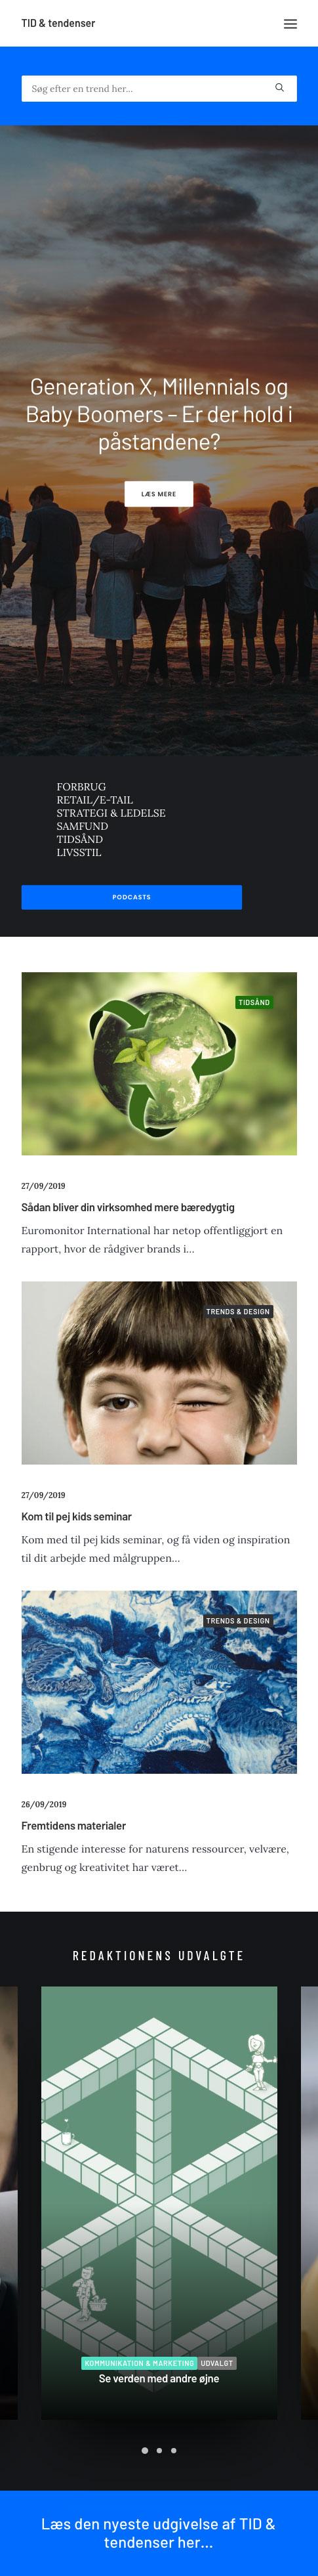 tidogtendenser.dk mobil version